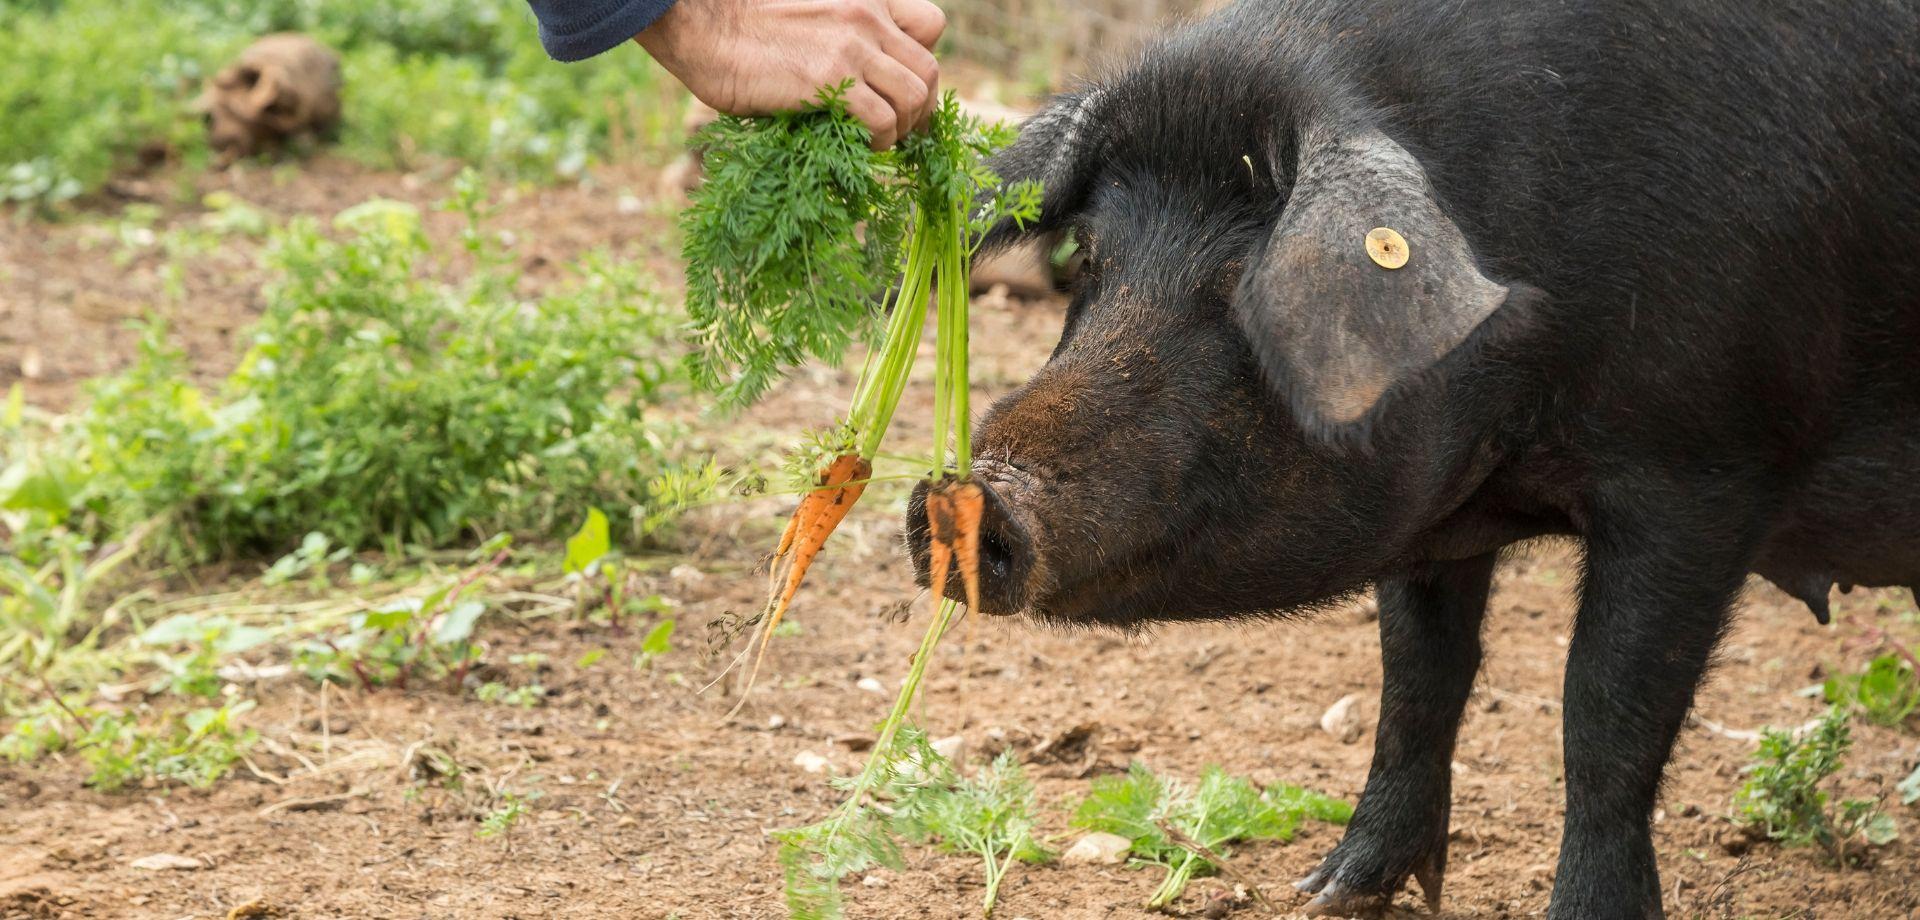 Agricoltura biodinamica cos'è?